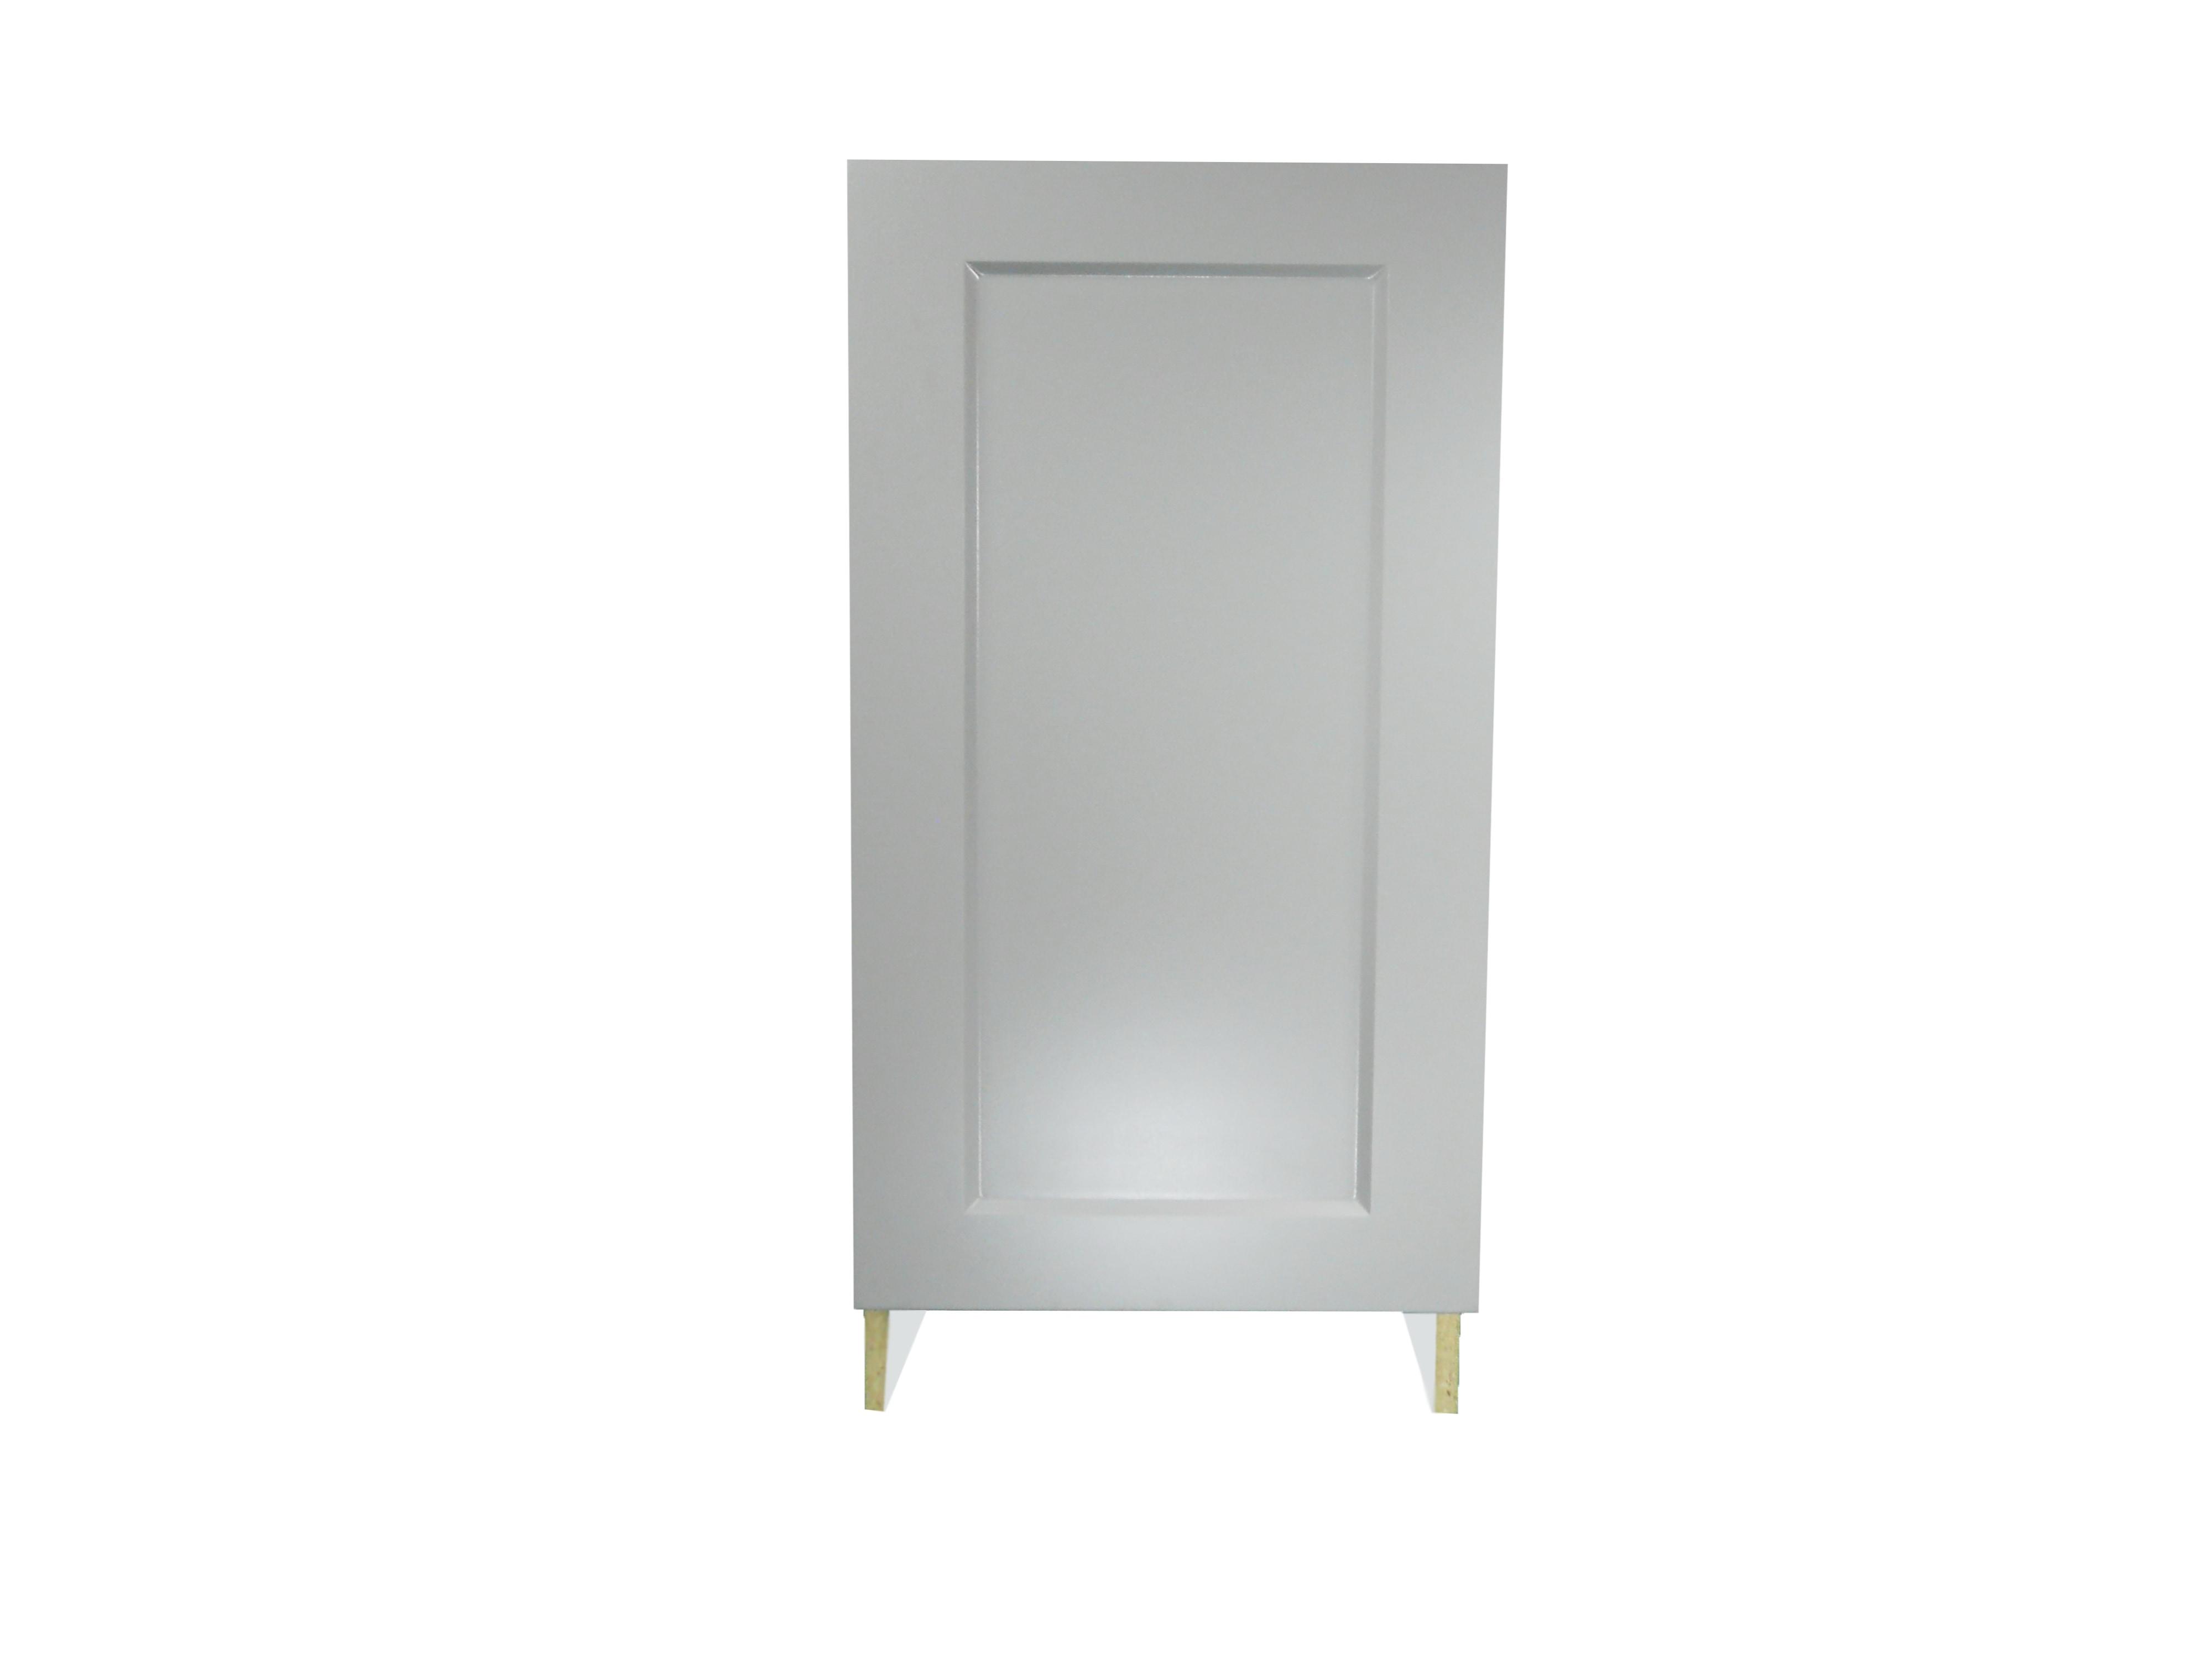 Base Cabinet With Door / Whistler Grey / Flat Panel Grey / 21 Whistler Grey 0